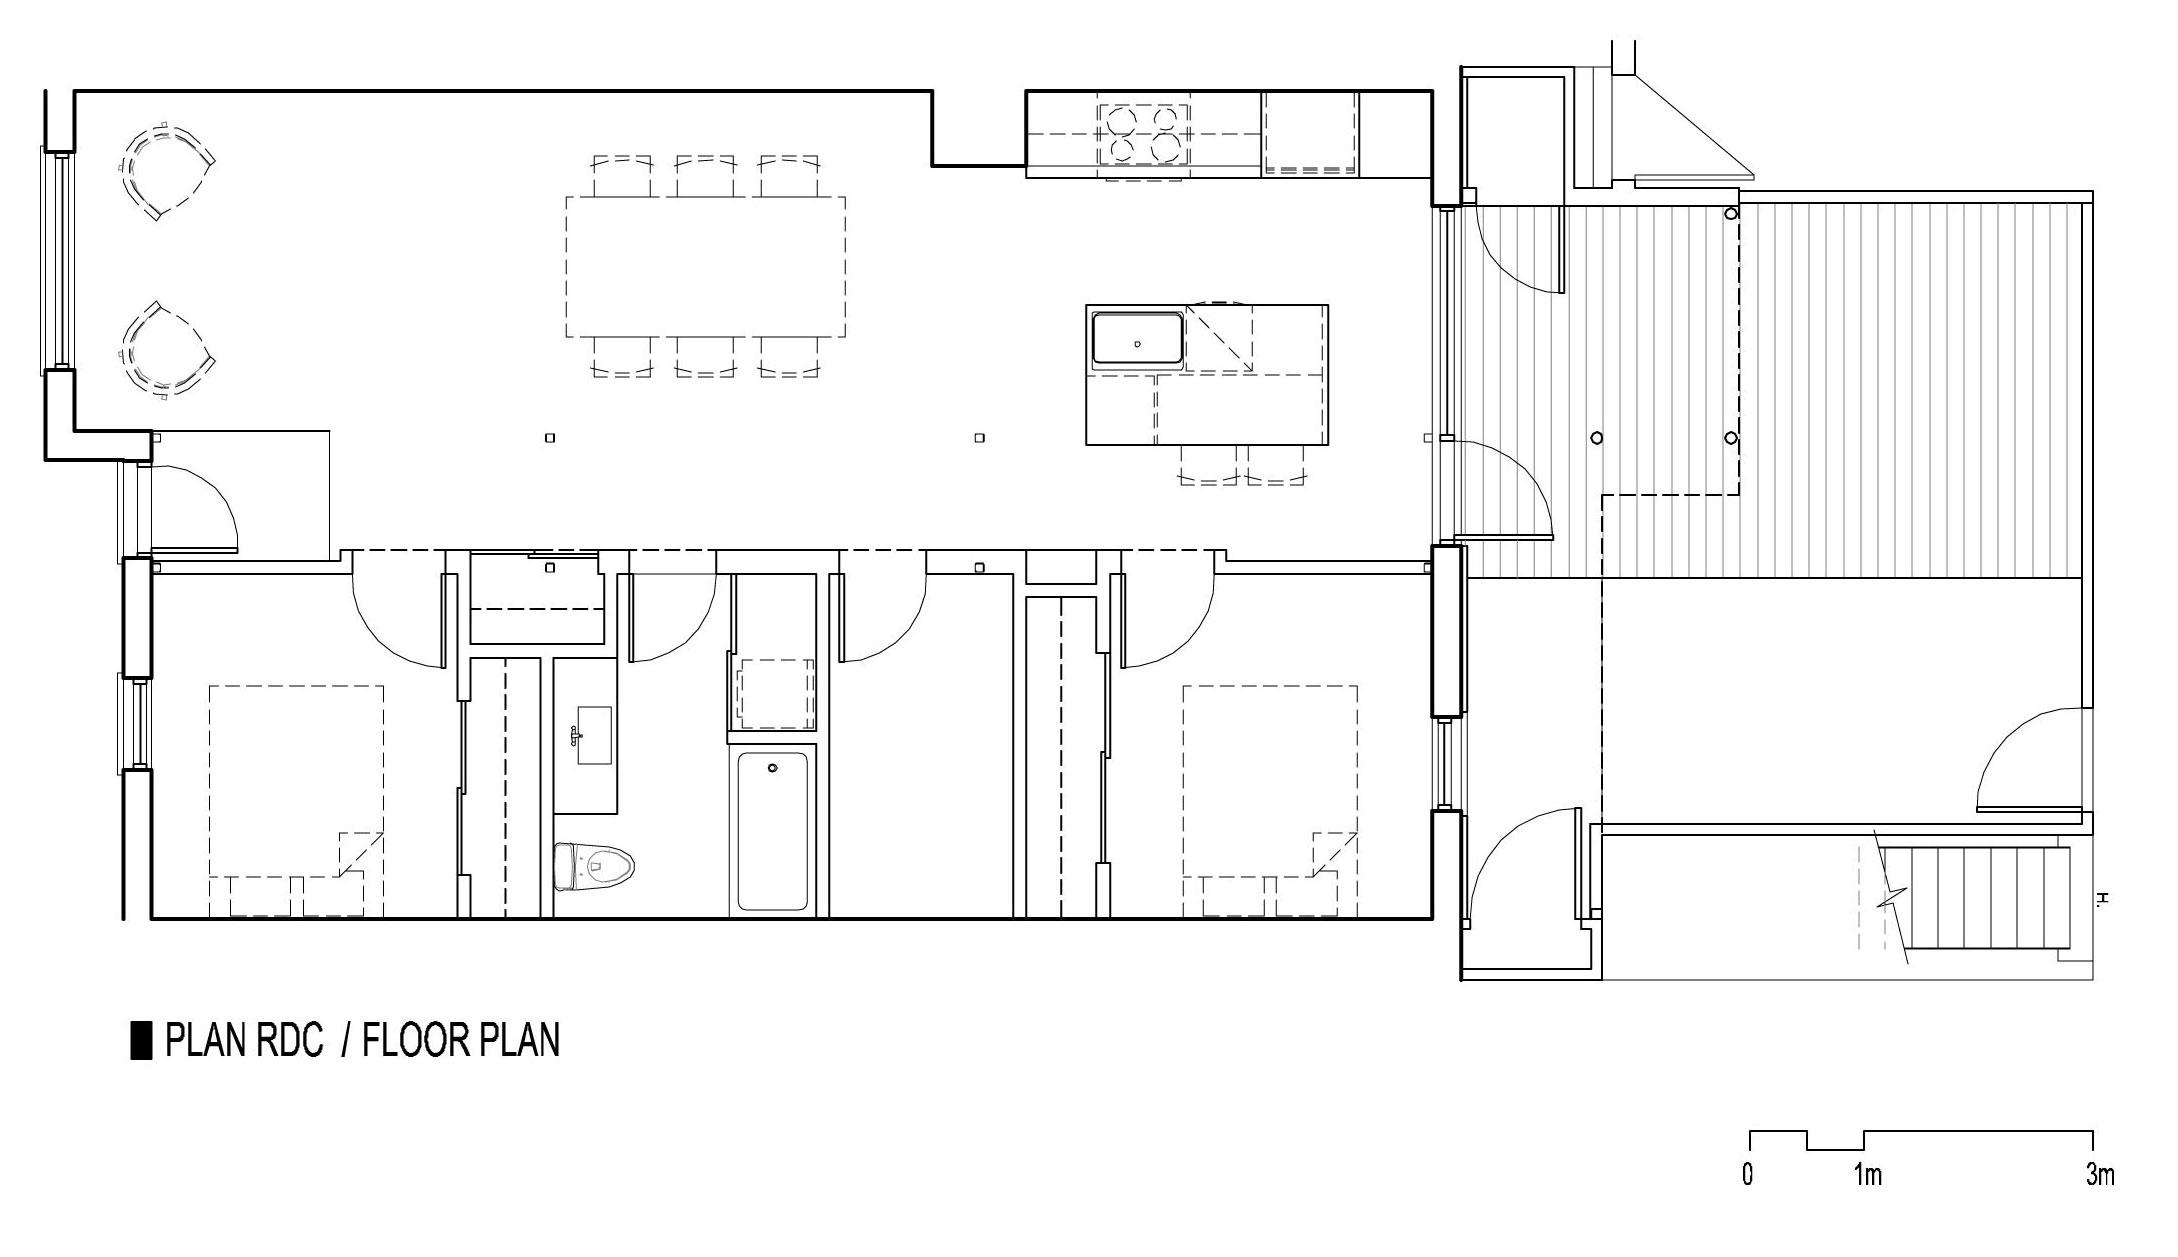 867 De Bougainville Apartment by Bourgeois:Lechasseur architects-12